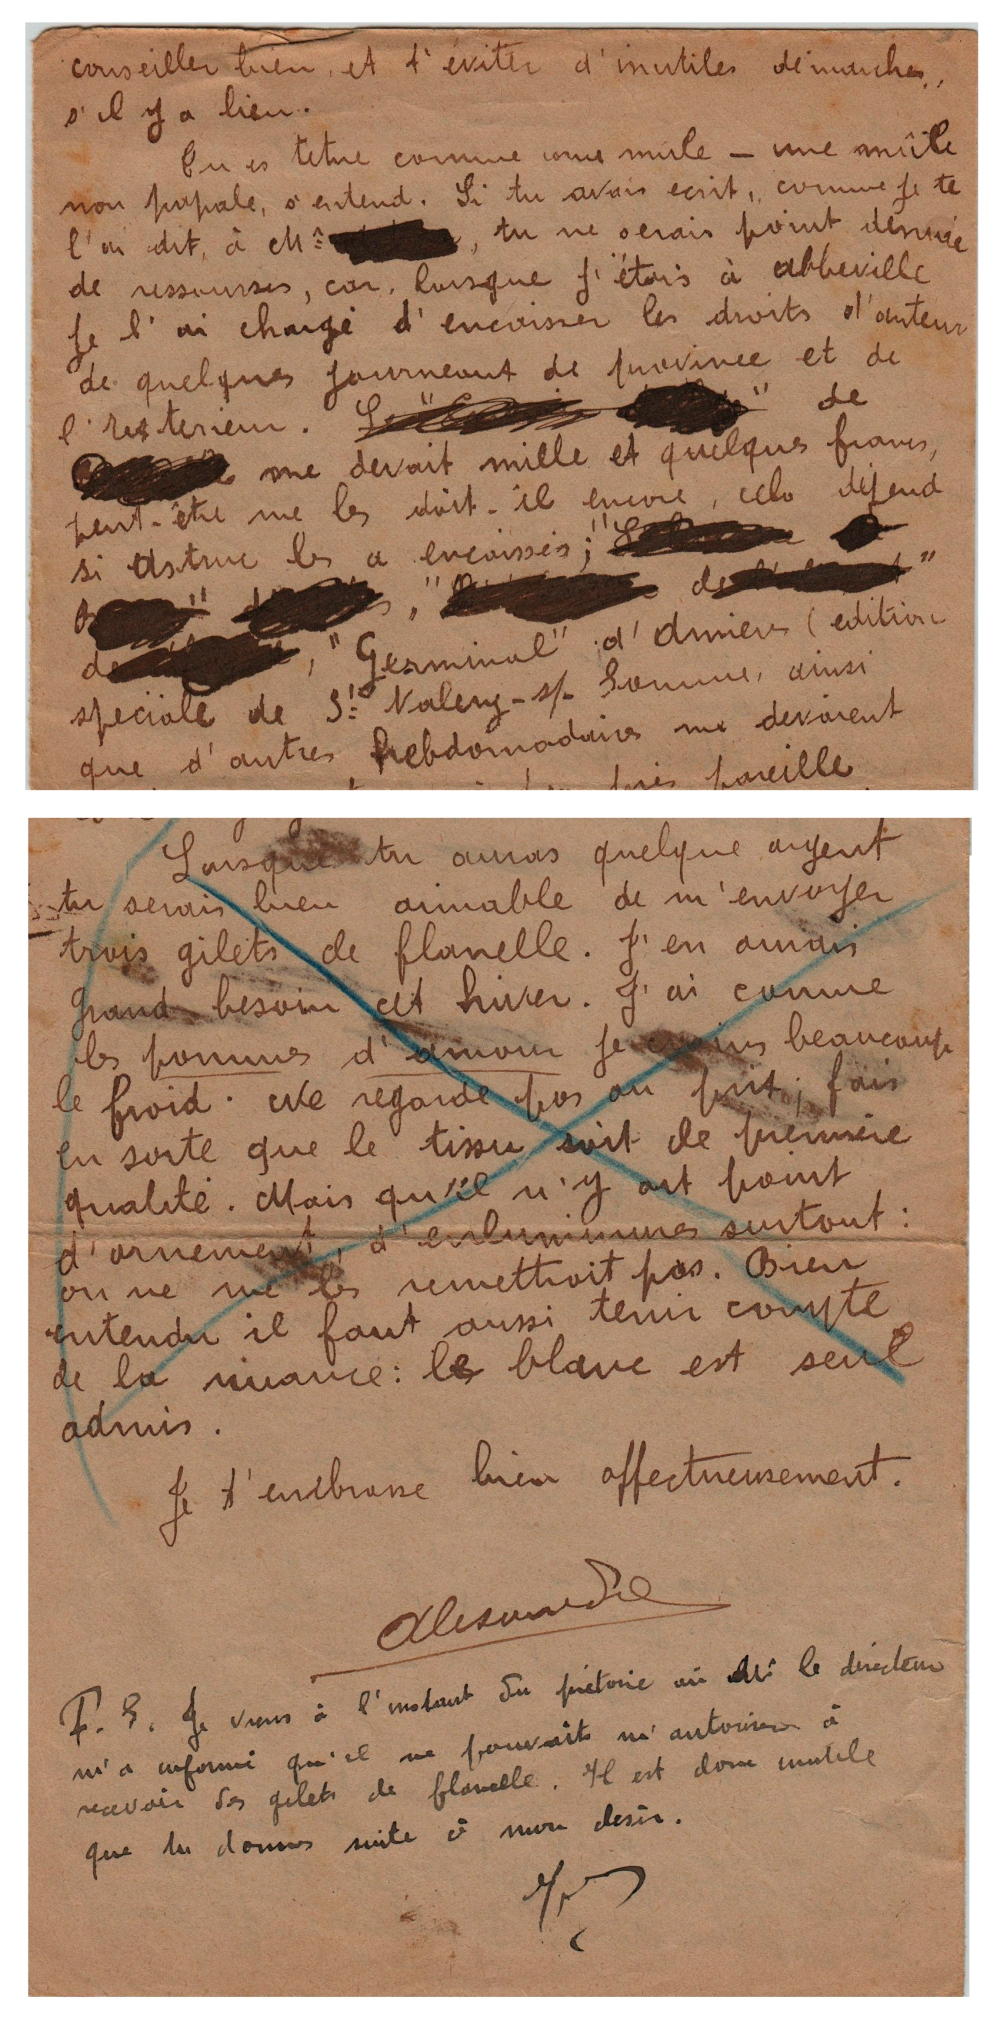 Censure_15.10.1905.jpg